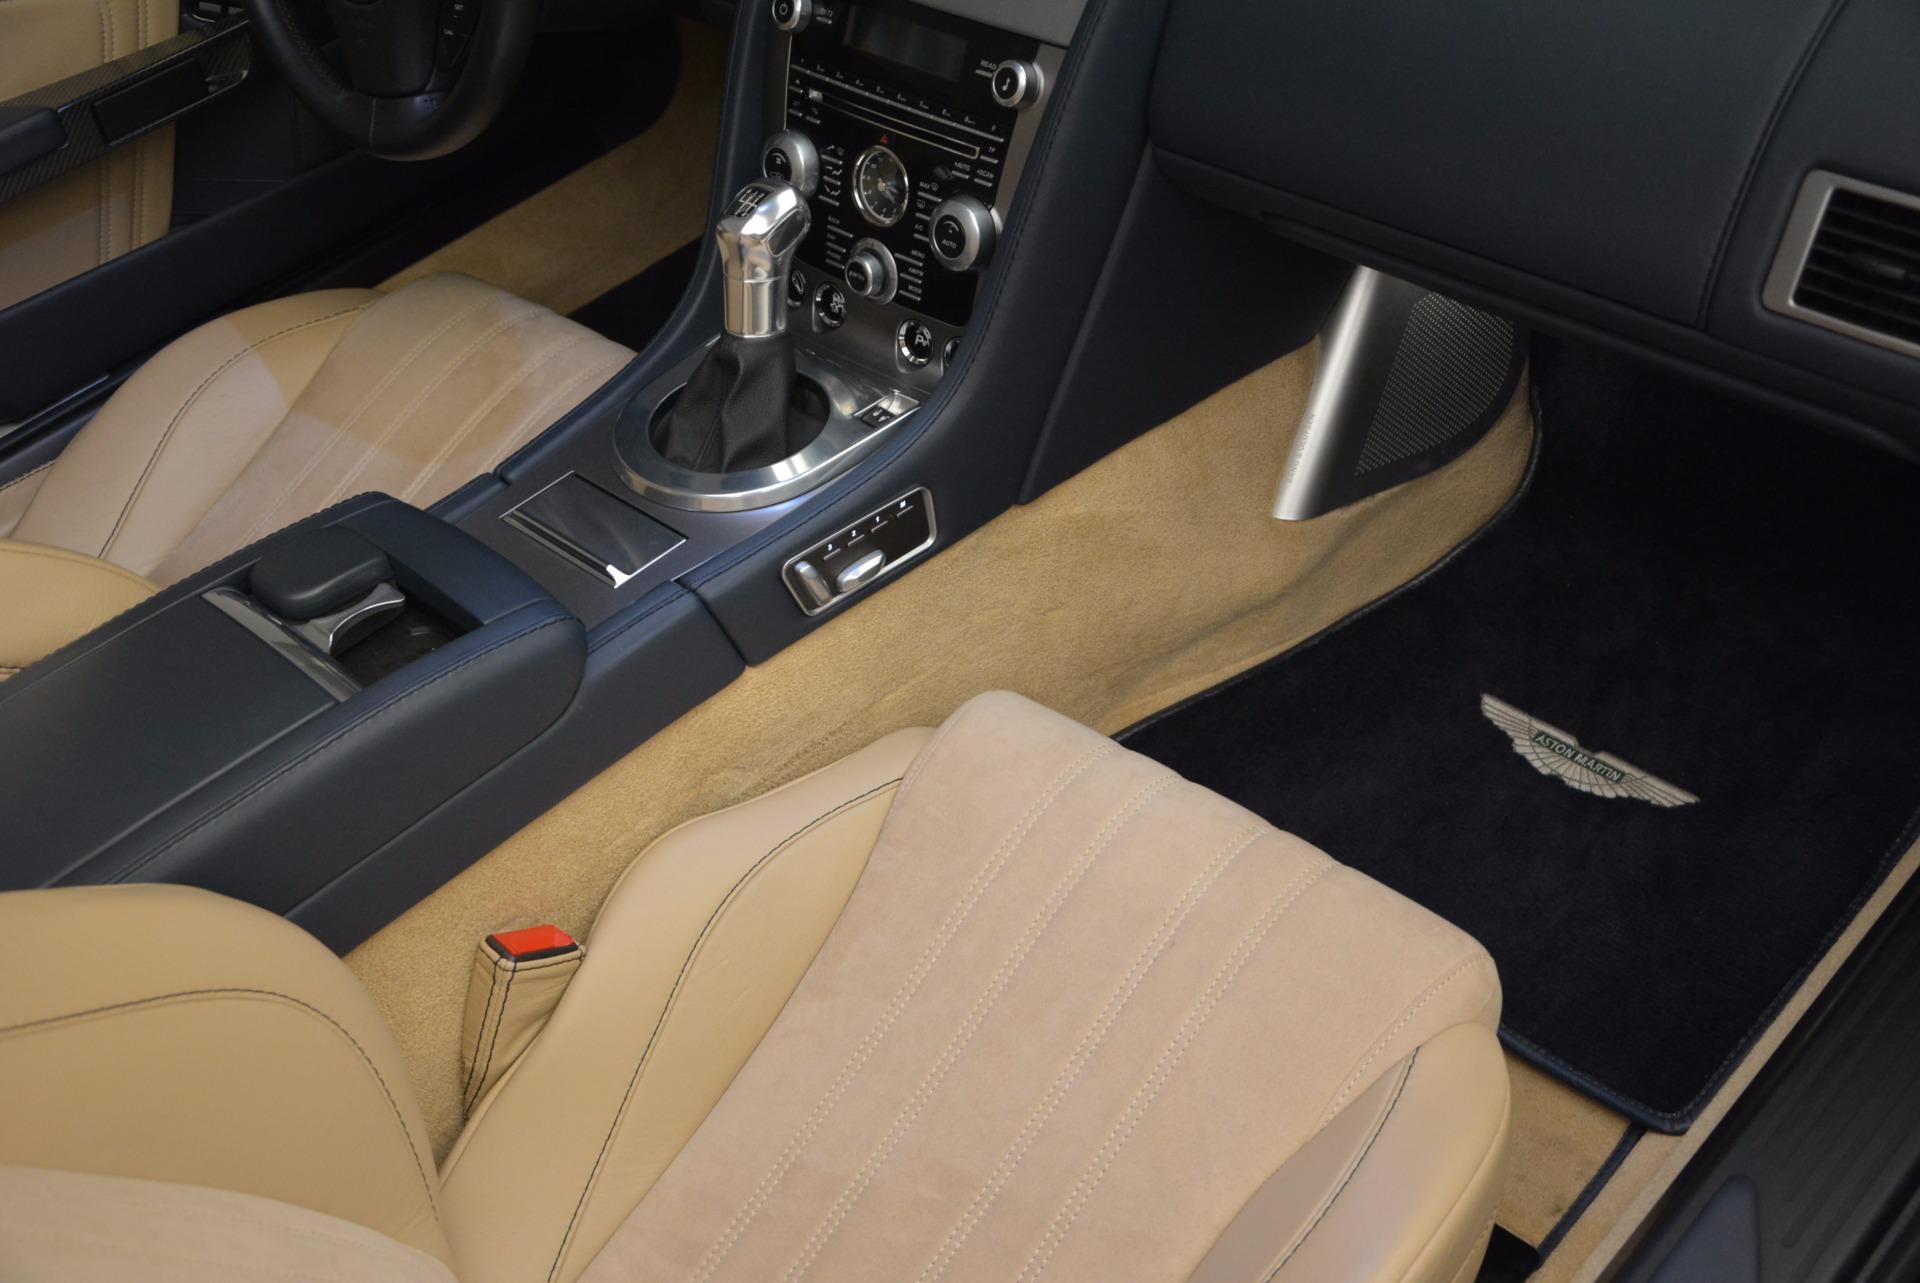 Used 2012 Aston Martin DBS Volante For Sale In Greenwich, CT 644_p32